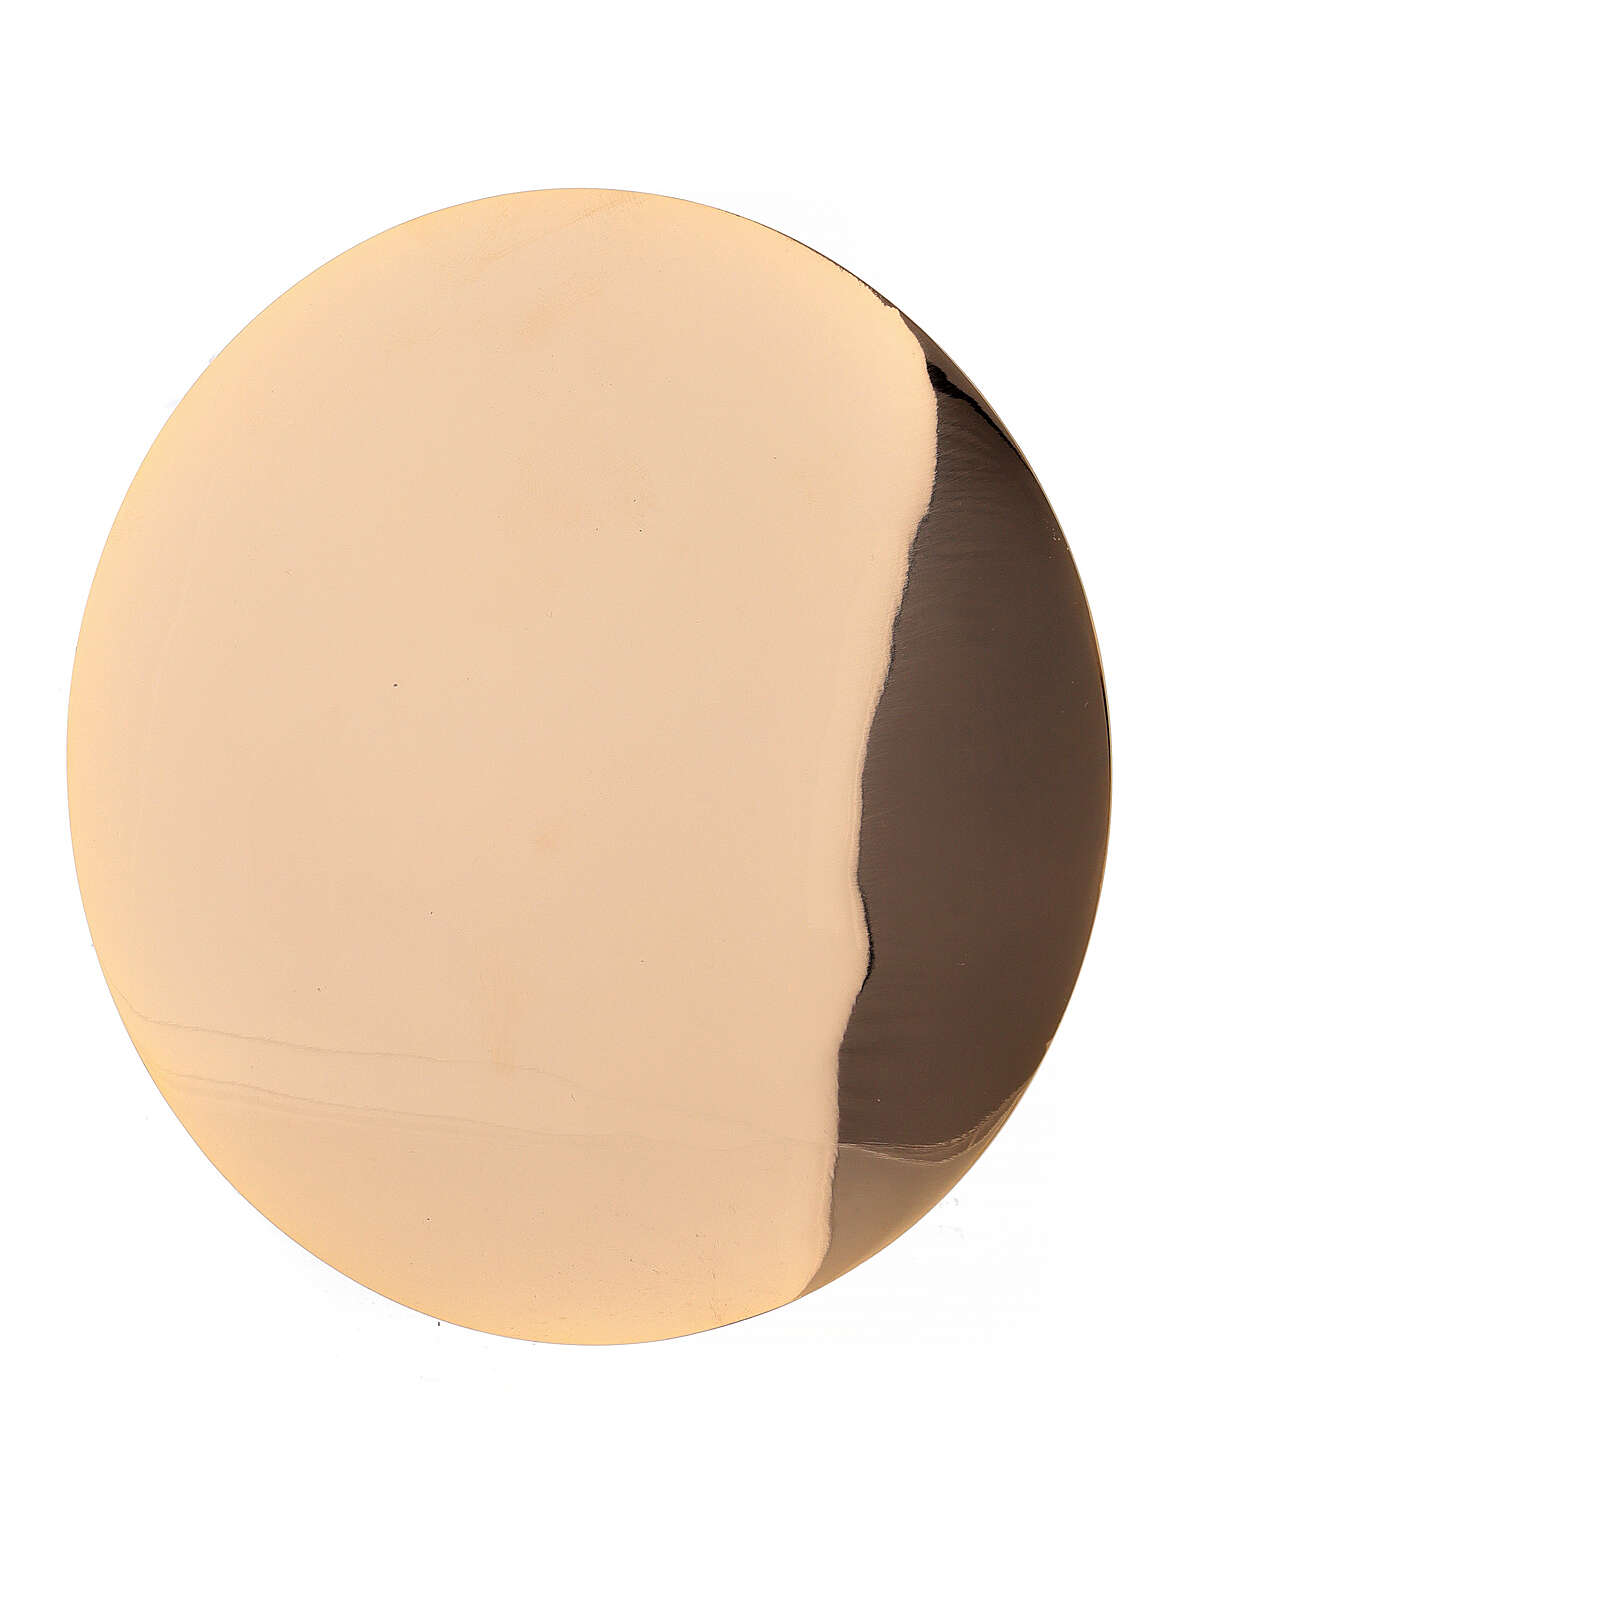 Patena ottone dorato liscia diametro 12,5 cm 4